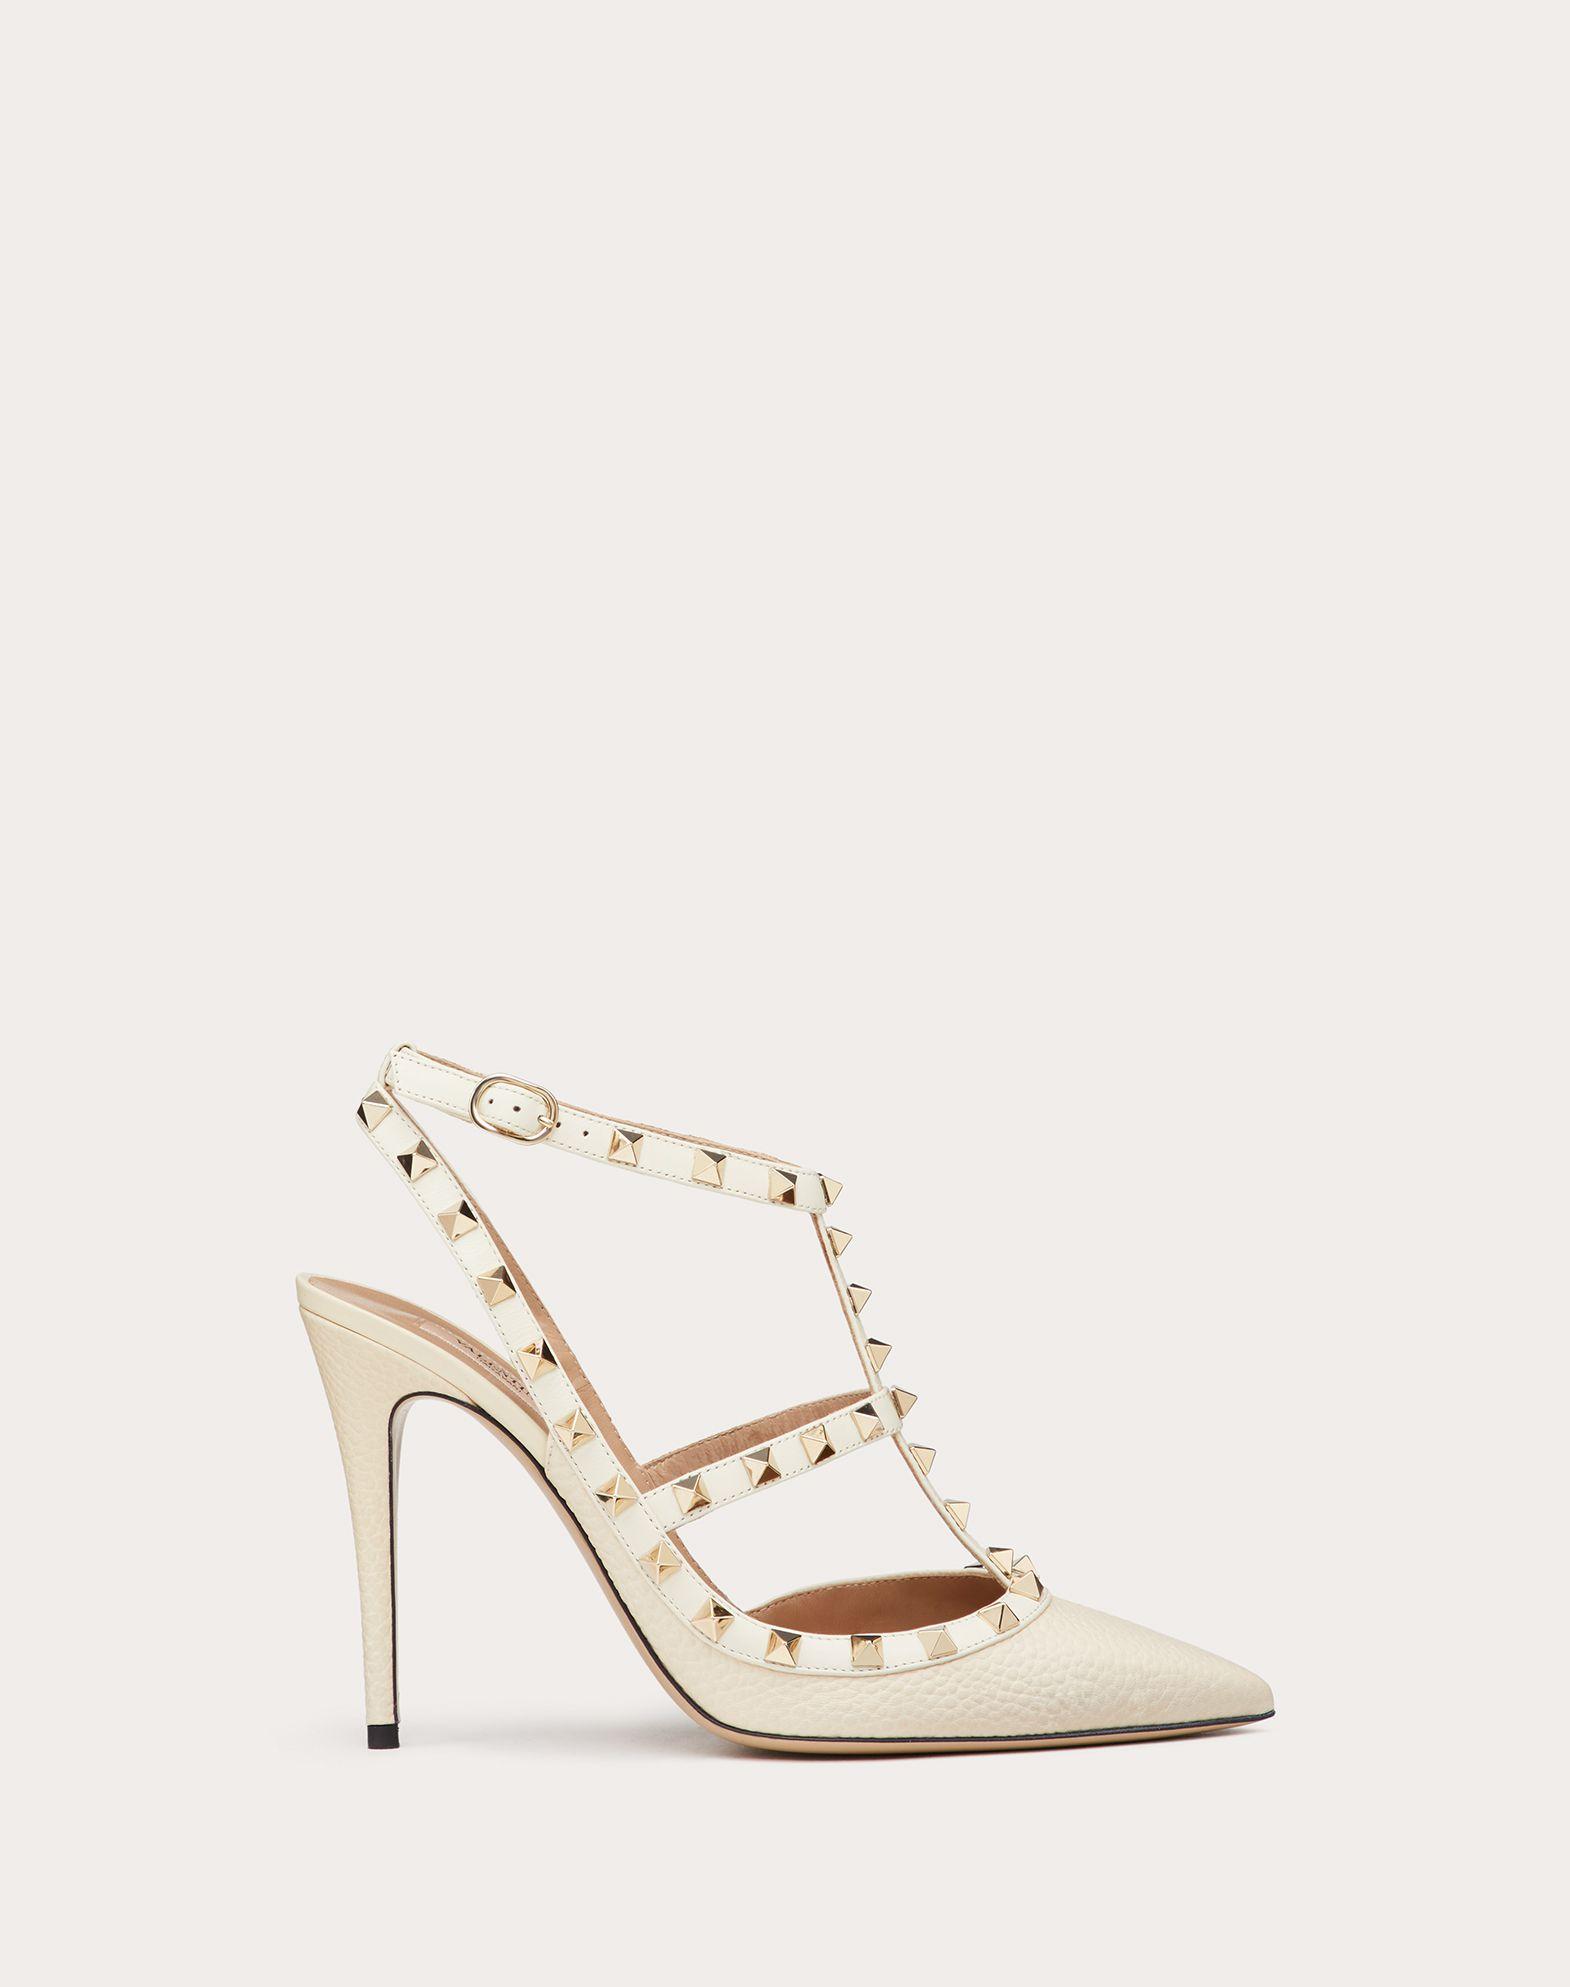 VALENTINO GARAVANI Rockstud Ankle Strap HIGH HEEL PUMPS D f